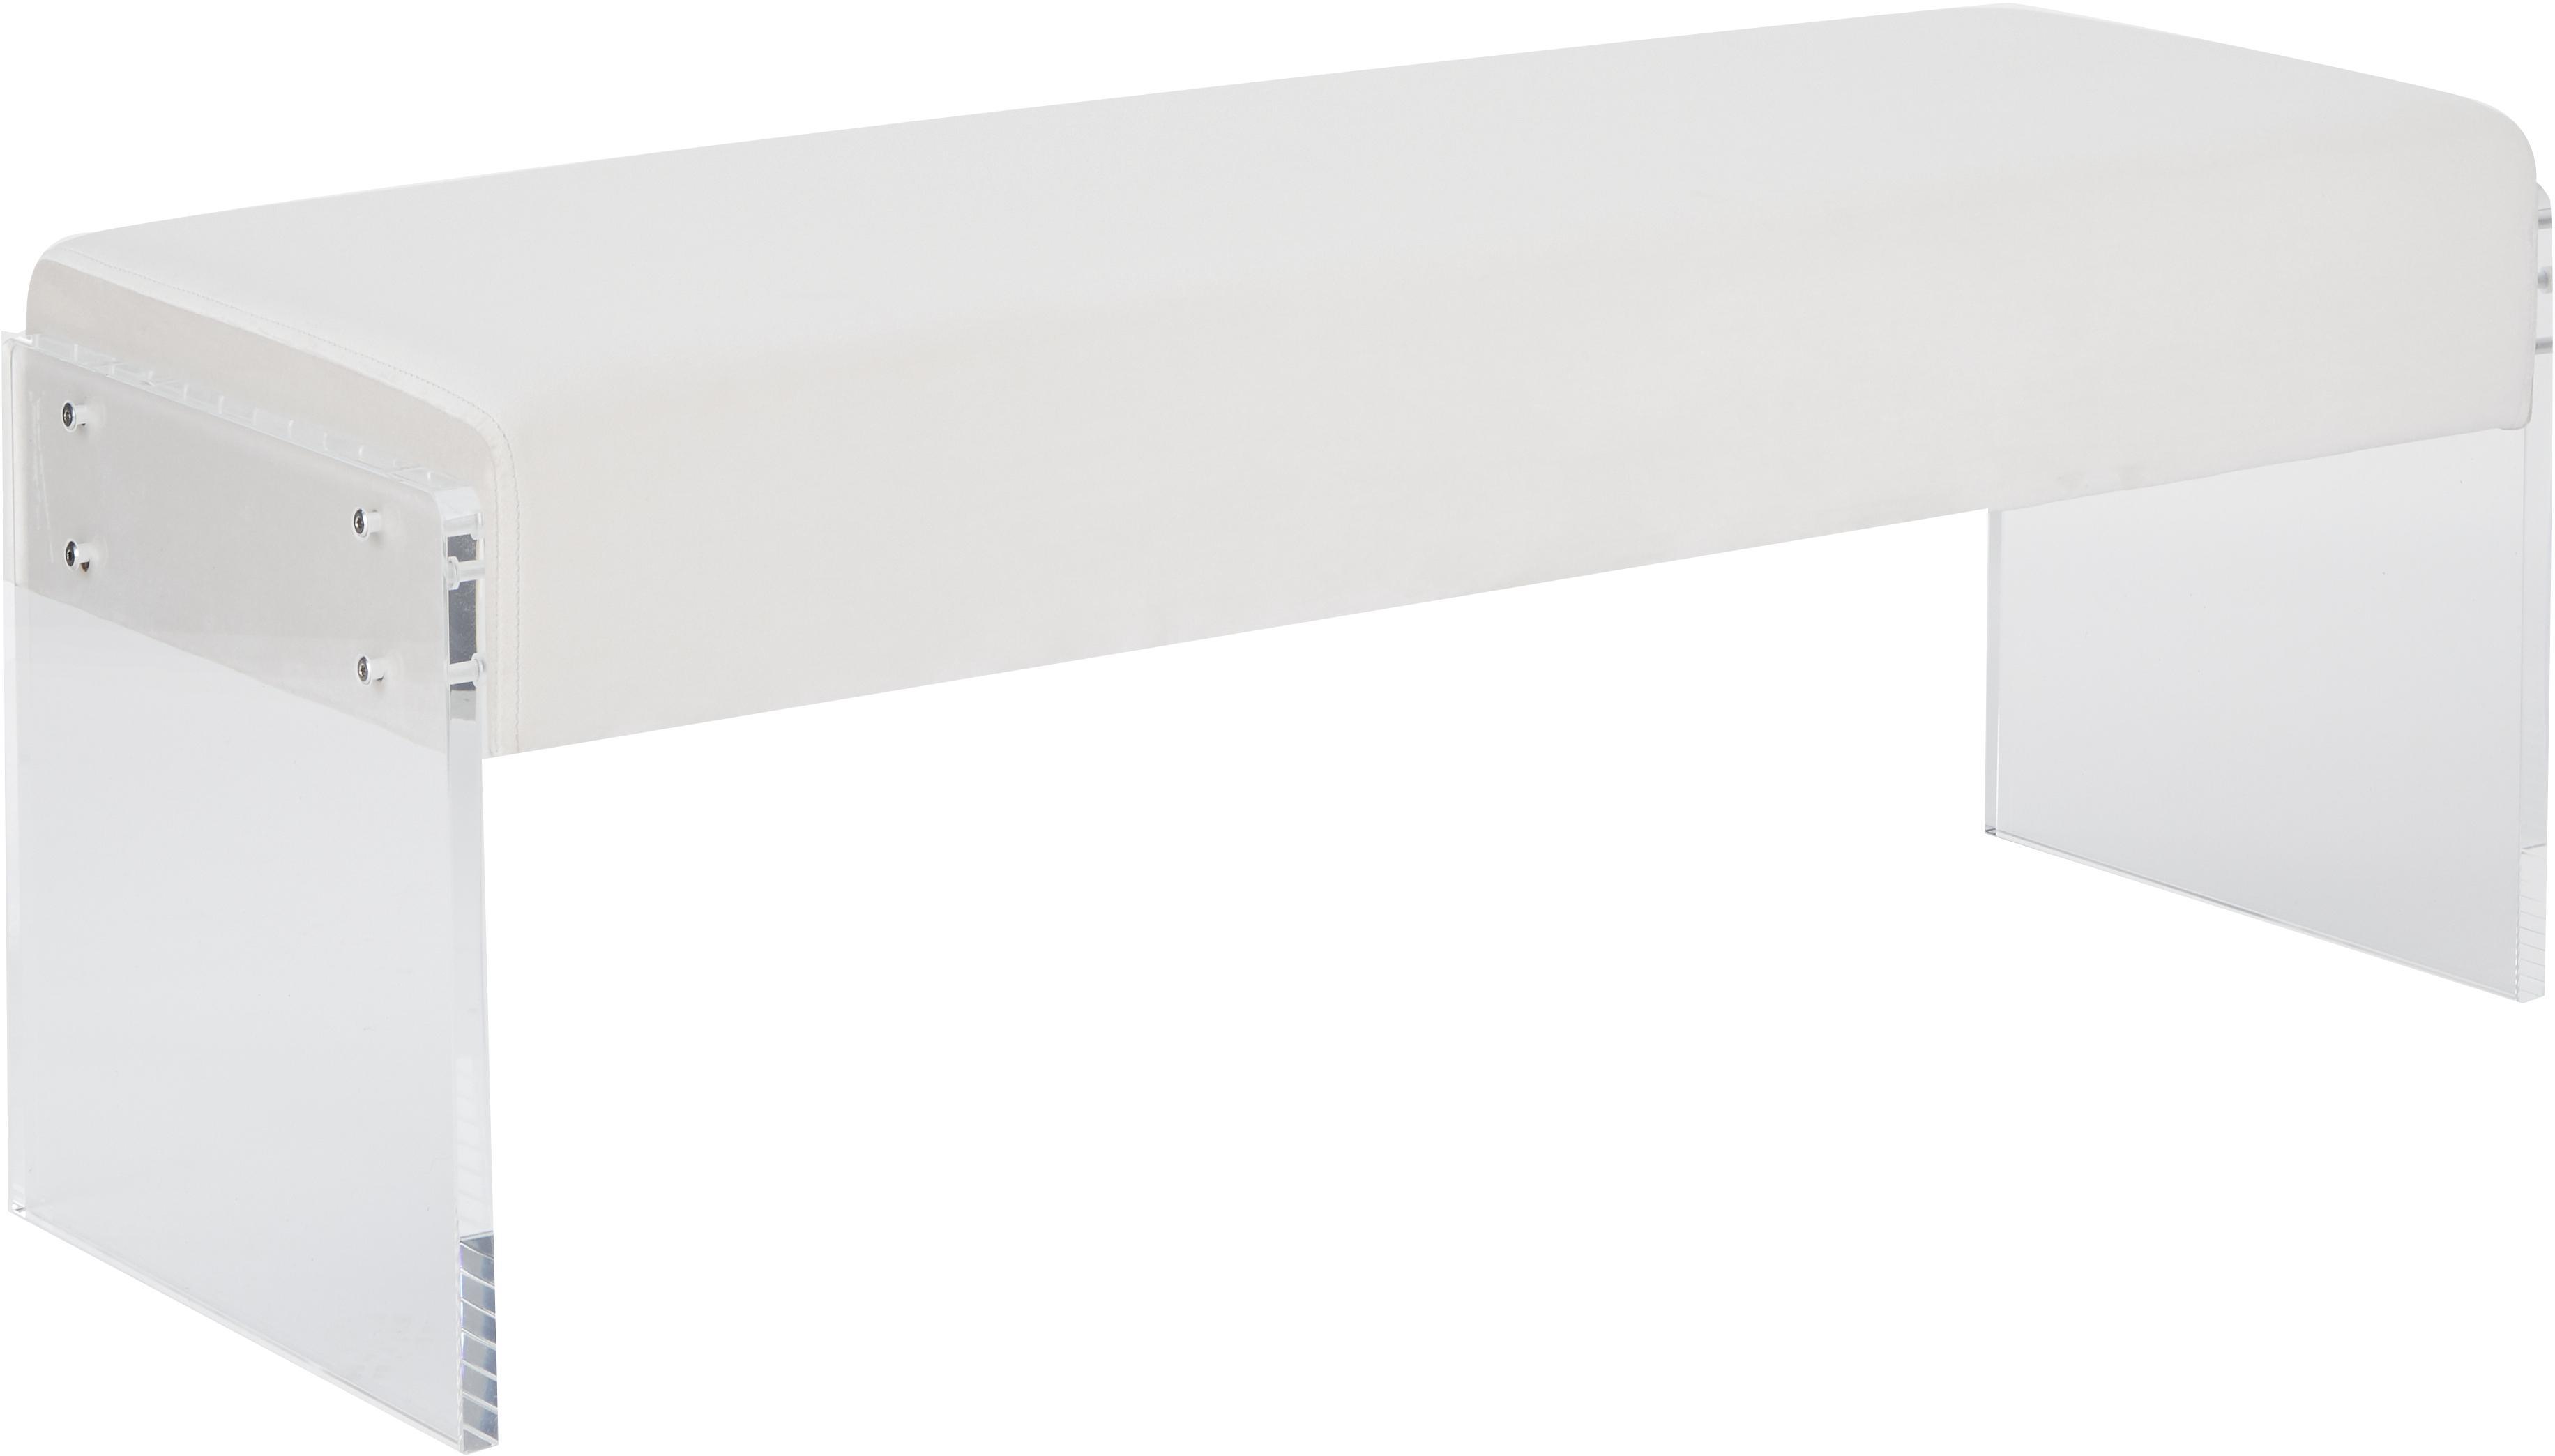 Samt-Polsterbank Ayden, Bezug: Samt (Polyester) 25.000 S, Gestell: Massives Pappelholz, Sper, Beine: Acrylglas, Bezug: BeigeGestell: Transparent, 116 x 43 cm